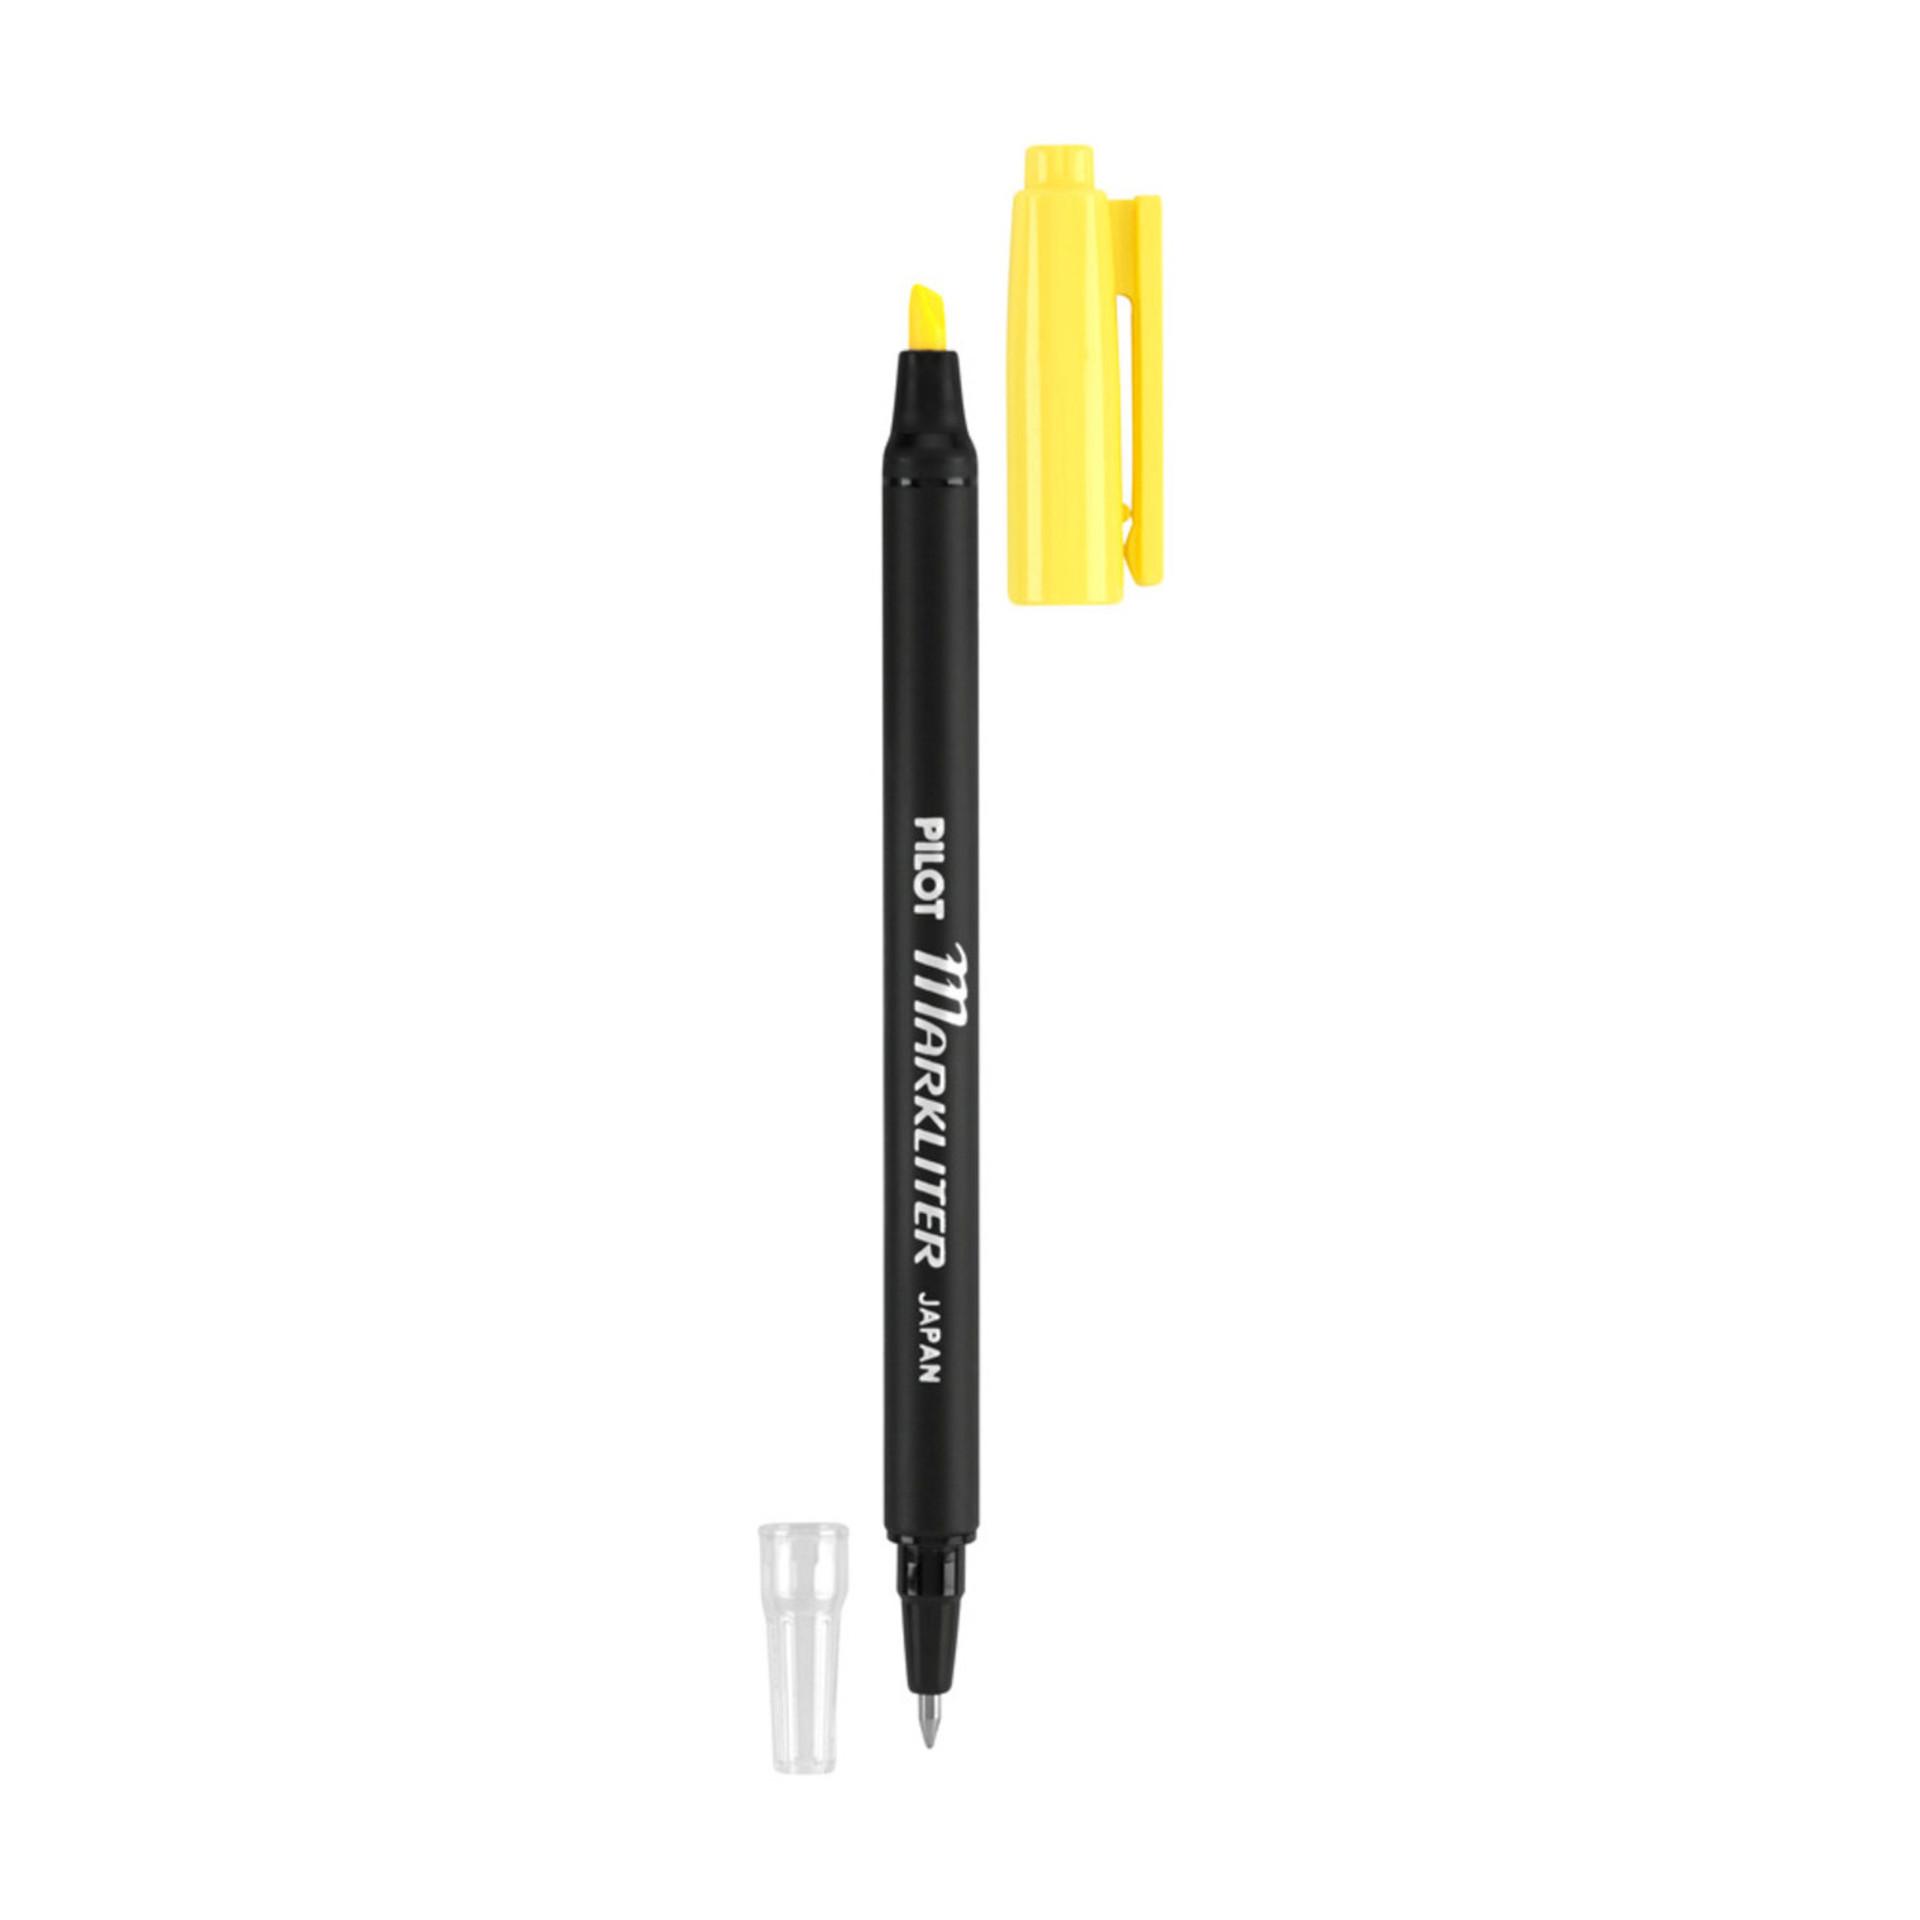 Pilot Markliter Dual-Tip Black Pen & Fluorescent Highlighter